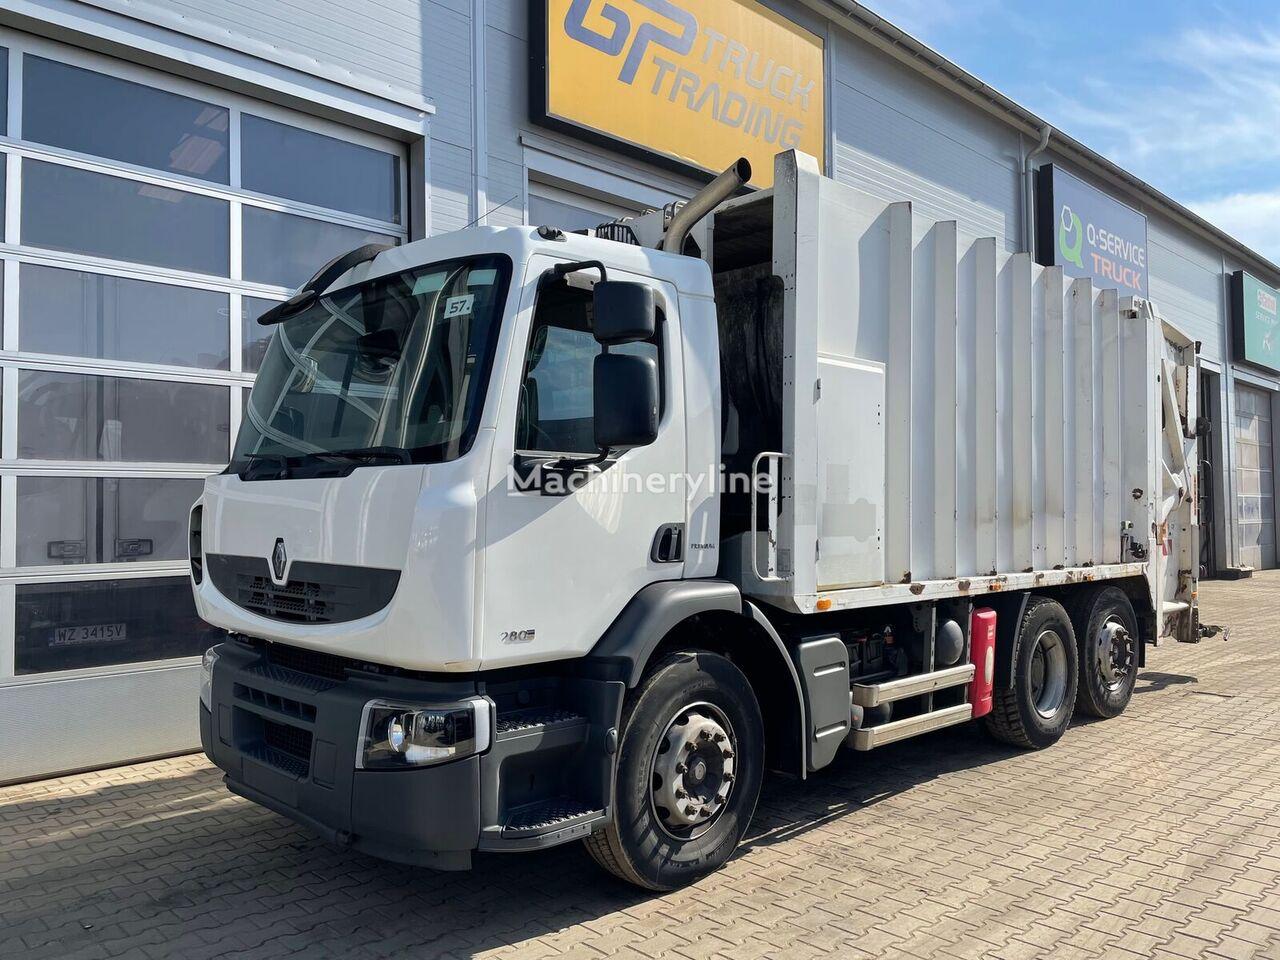 RENAULT Premium 280 garbage truck